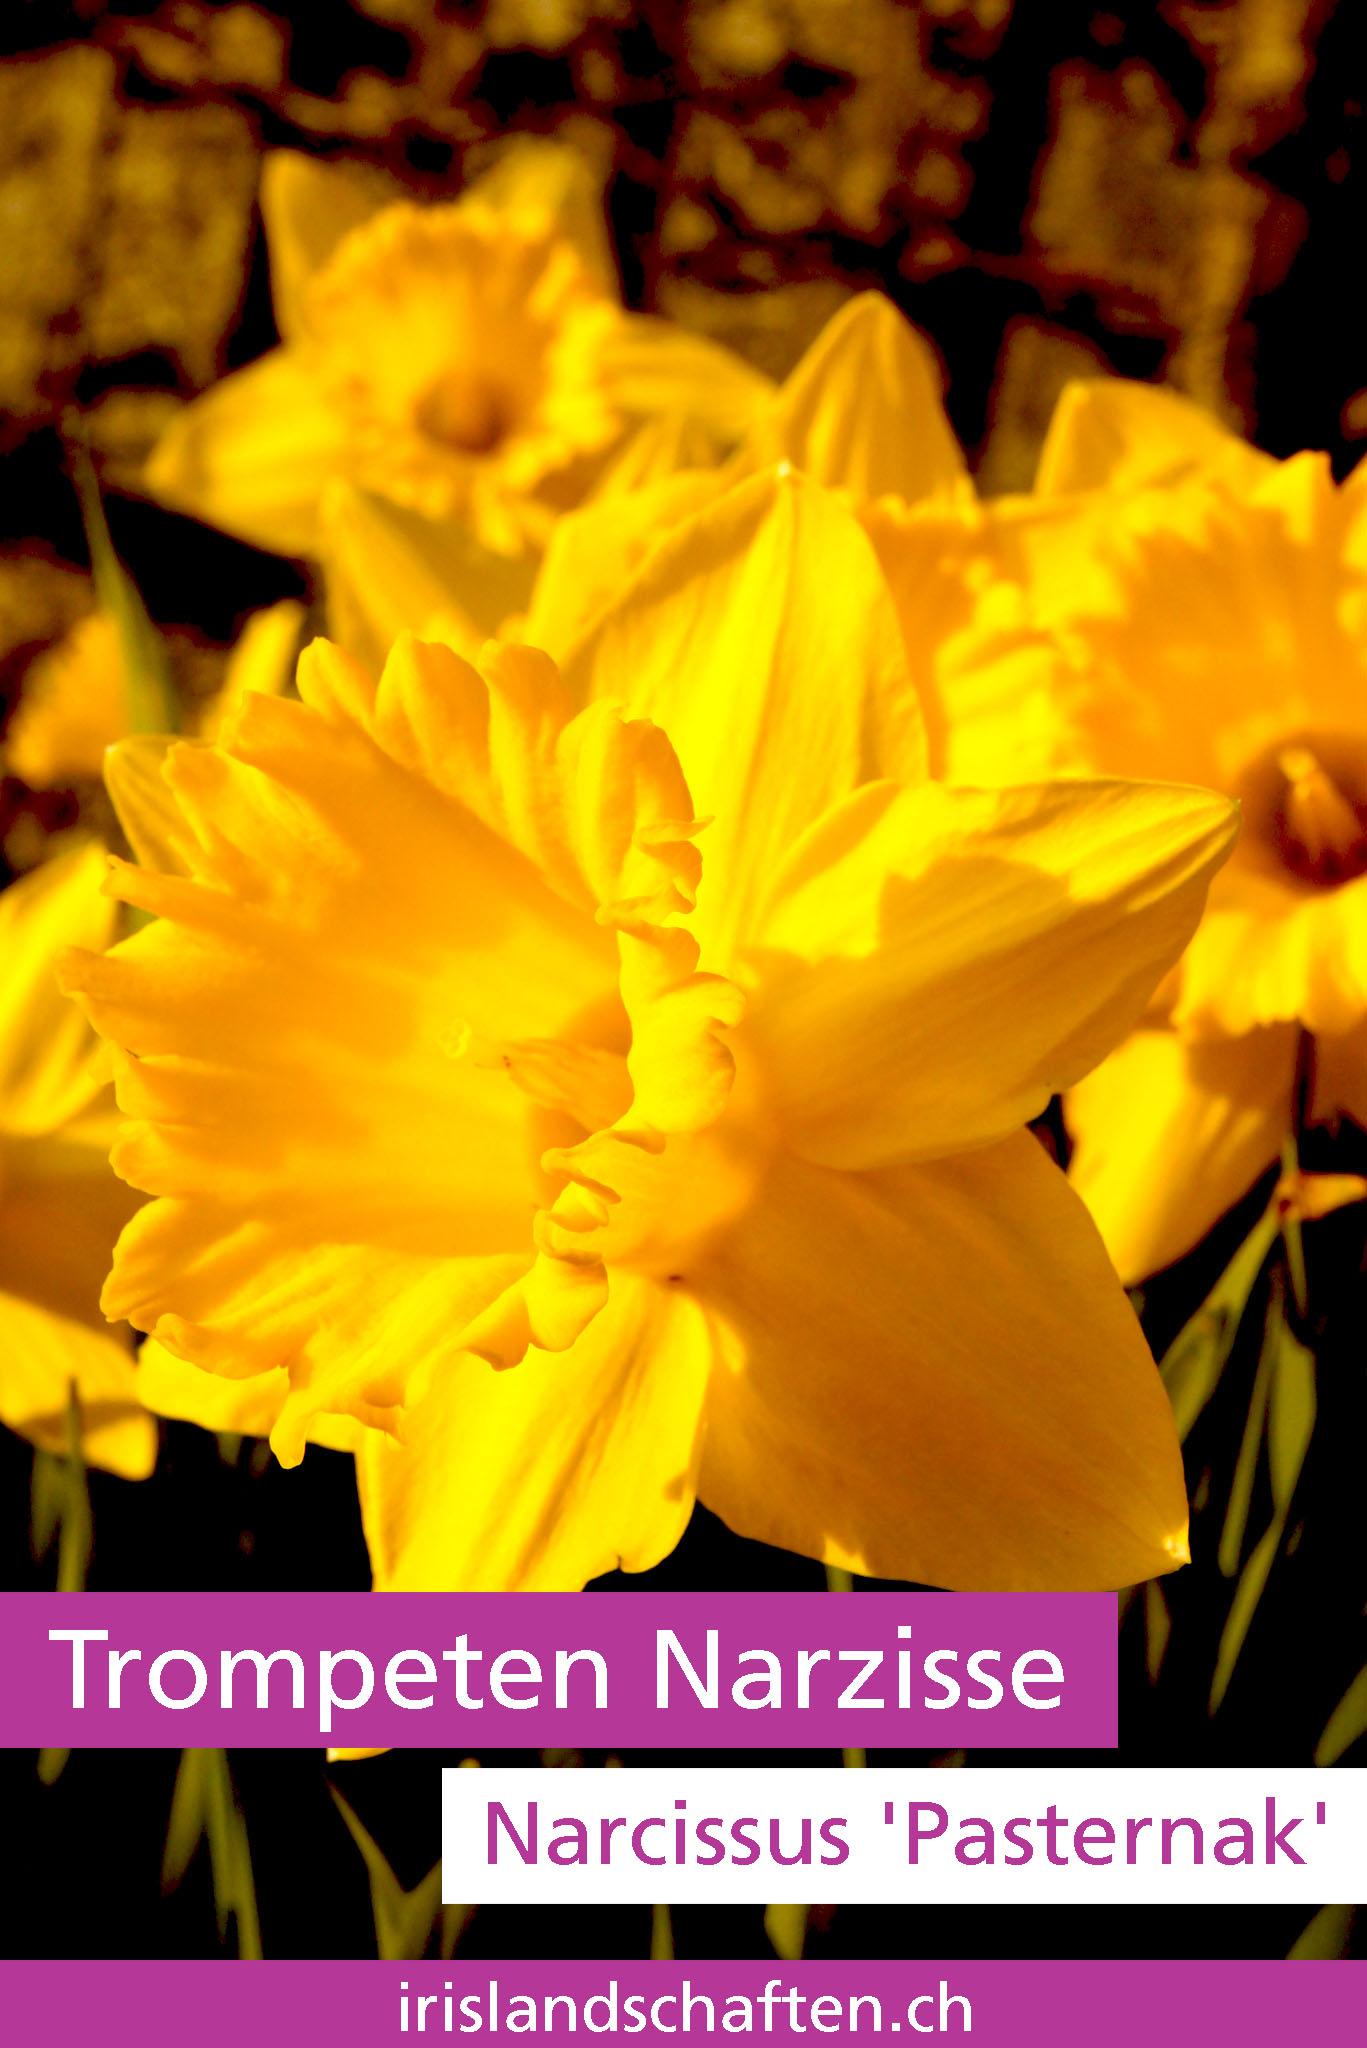 Trompeten Narzisse Narcissus Pasternak Gartengestaltung